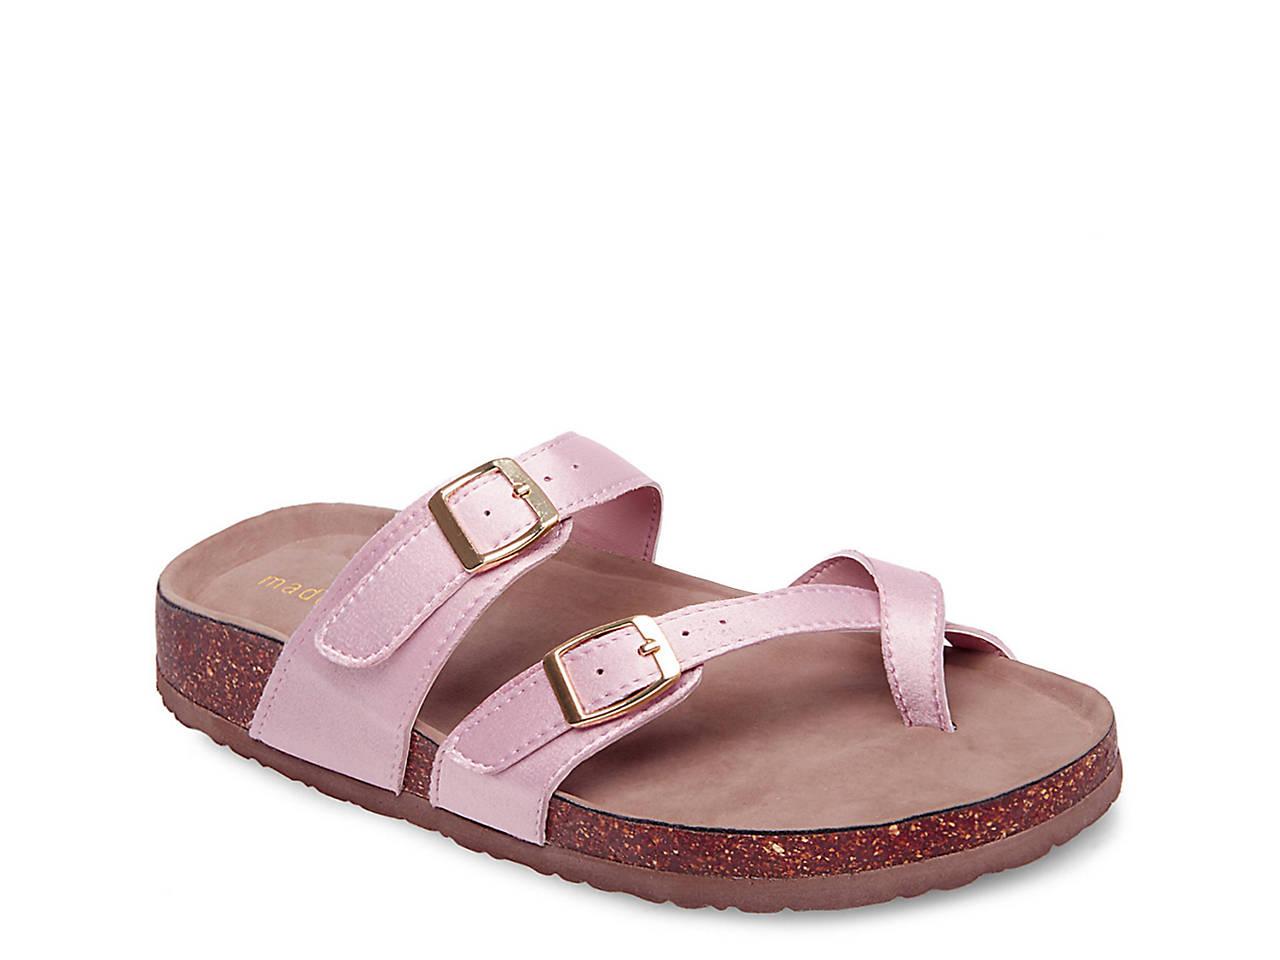 Bryceee Flat Sandal